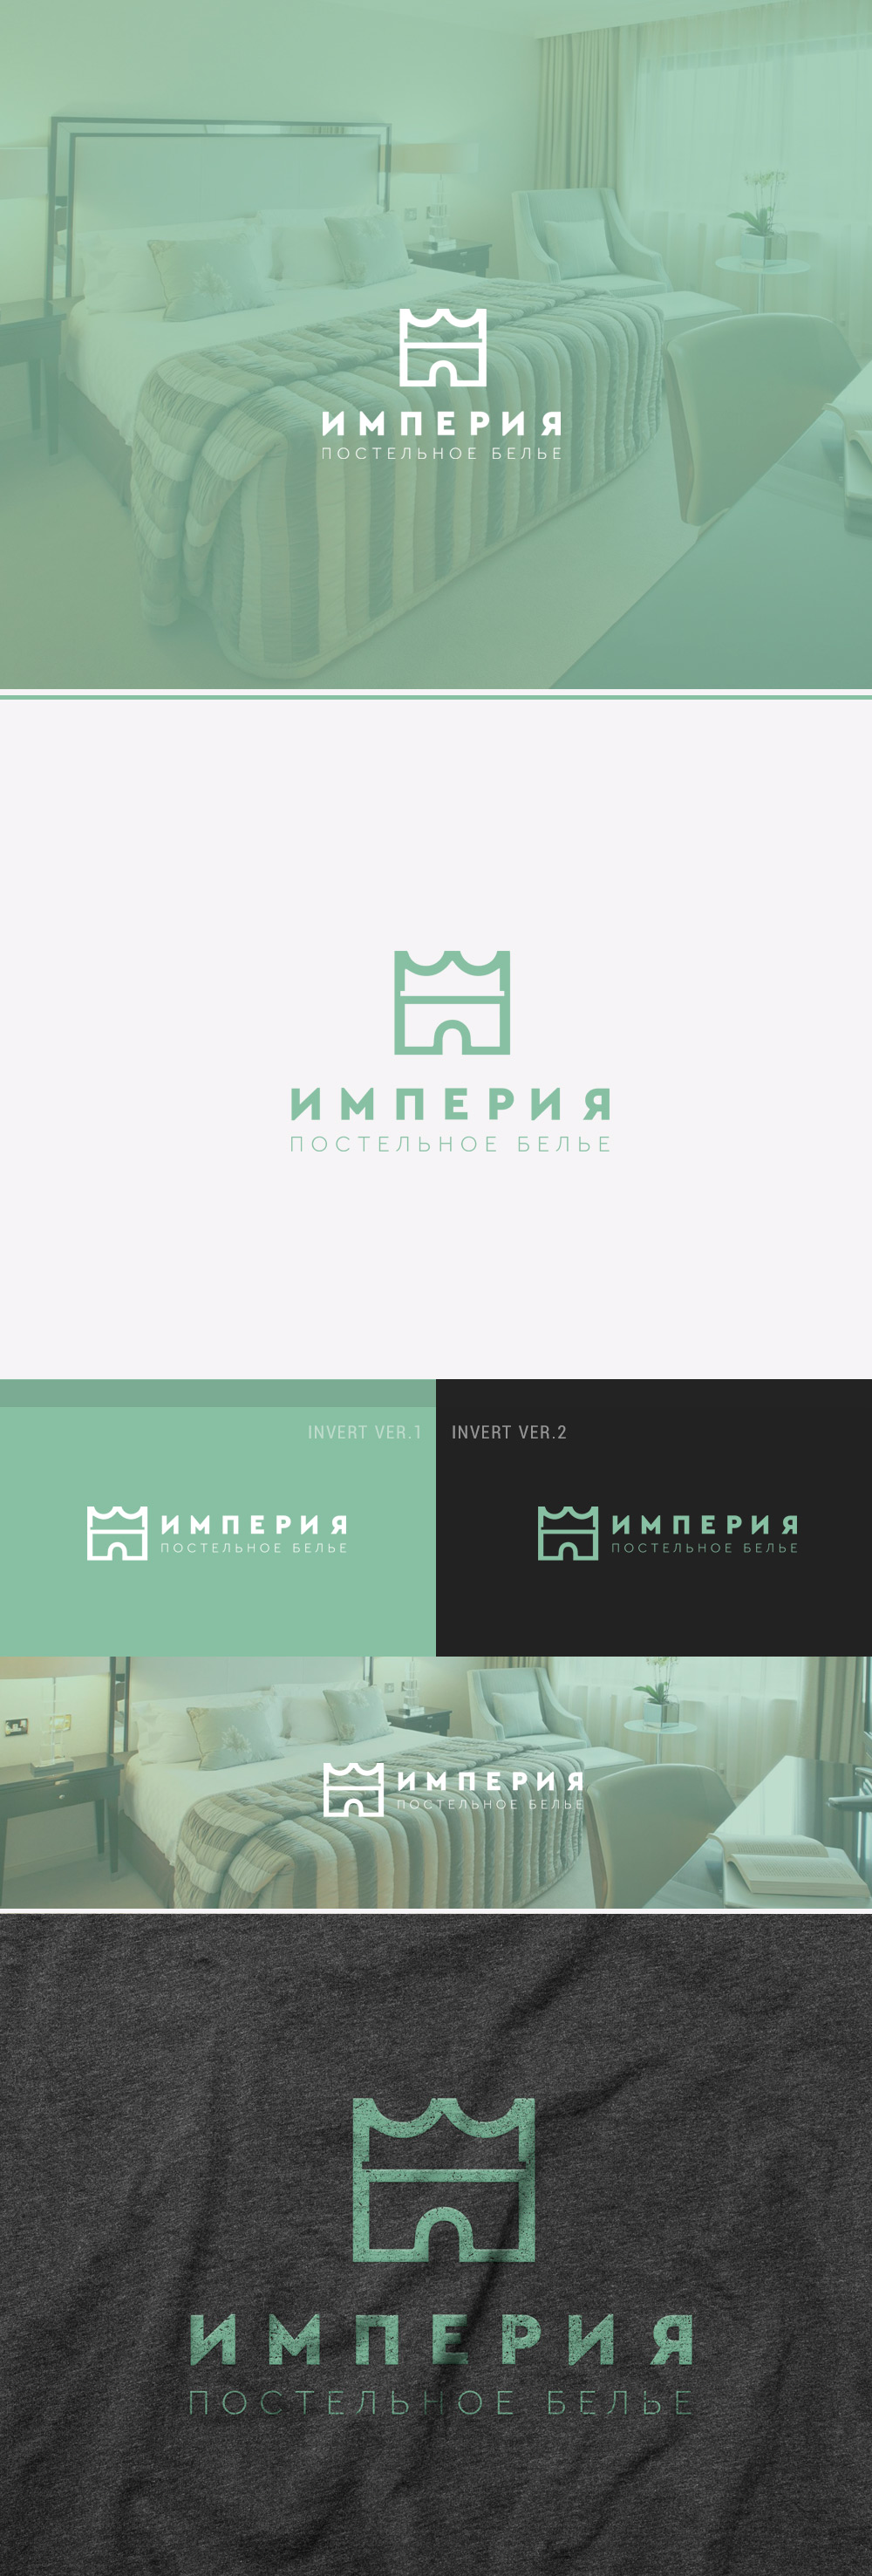 Разработать логотип для нового бренда фото f_29859e47ee3db278.jpg